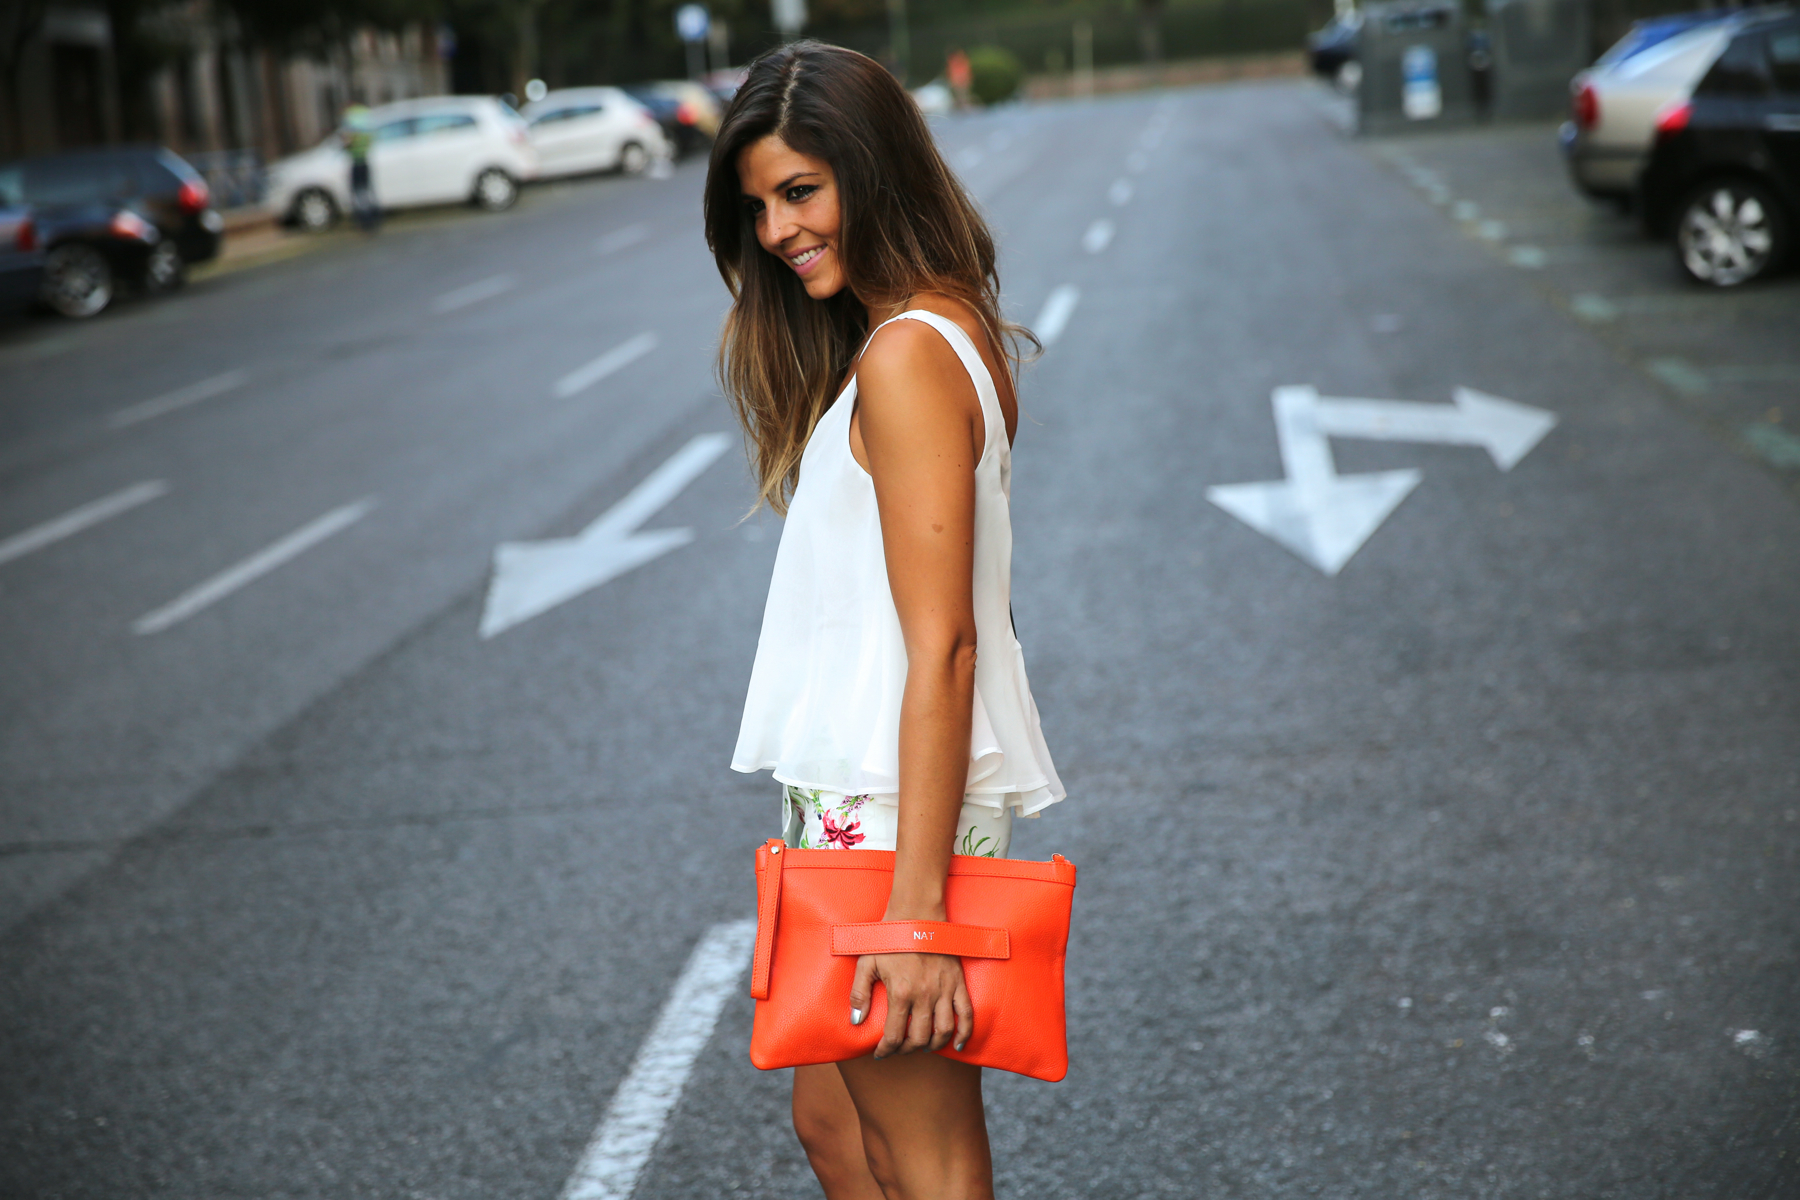 trendy_taste-look-outfit-street_style-ootd-blog-blogger-fashion_spain-moda_españa-sandalias_plateadas-silver_sandals-flower_print-falda_flores-top_blanco-3